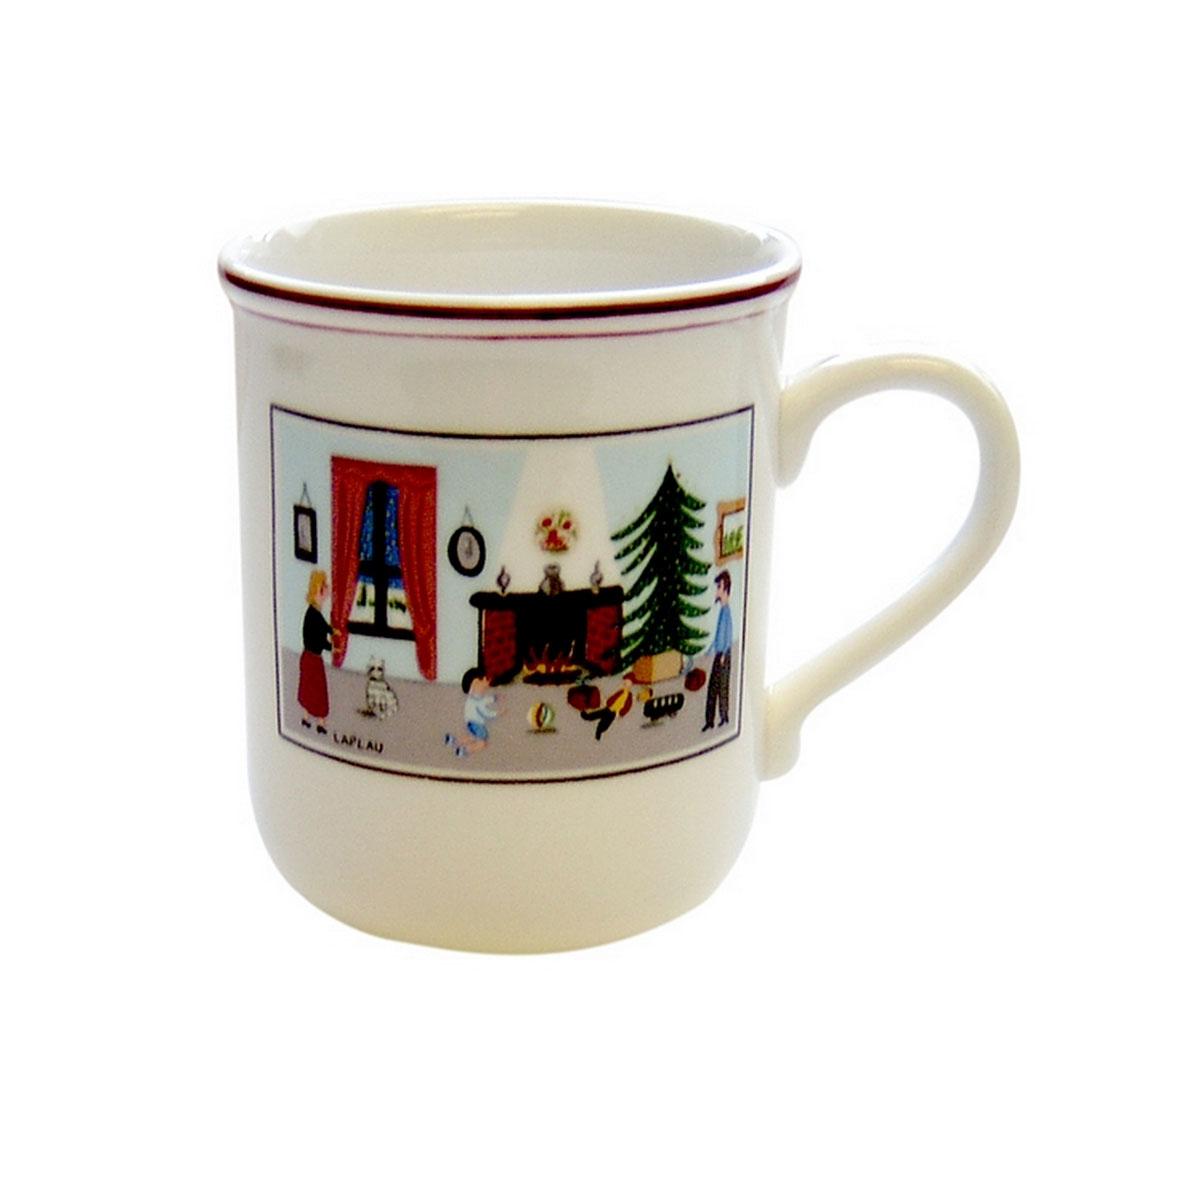 Villeroy and Boch Naif Christmas Mug